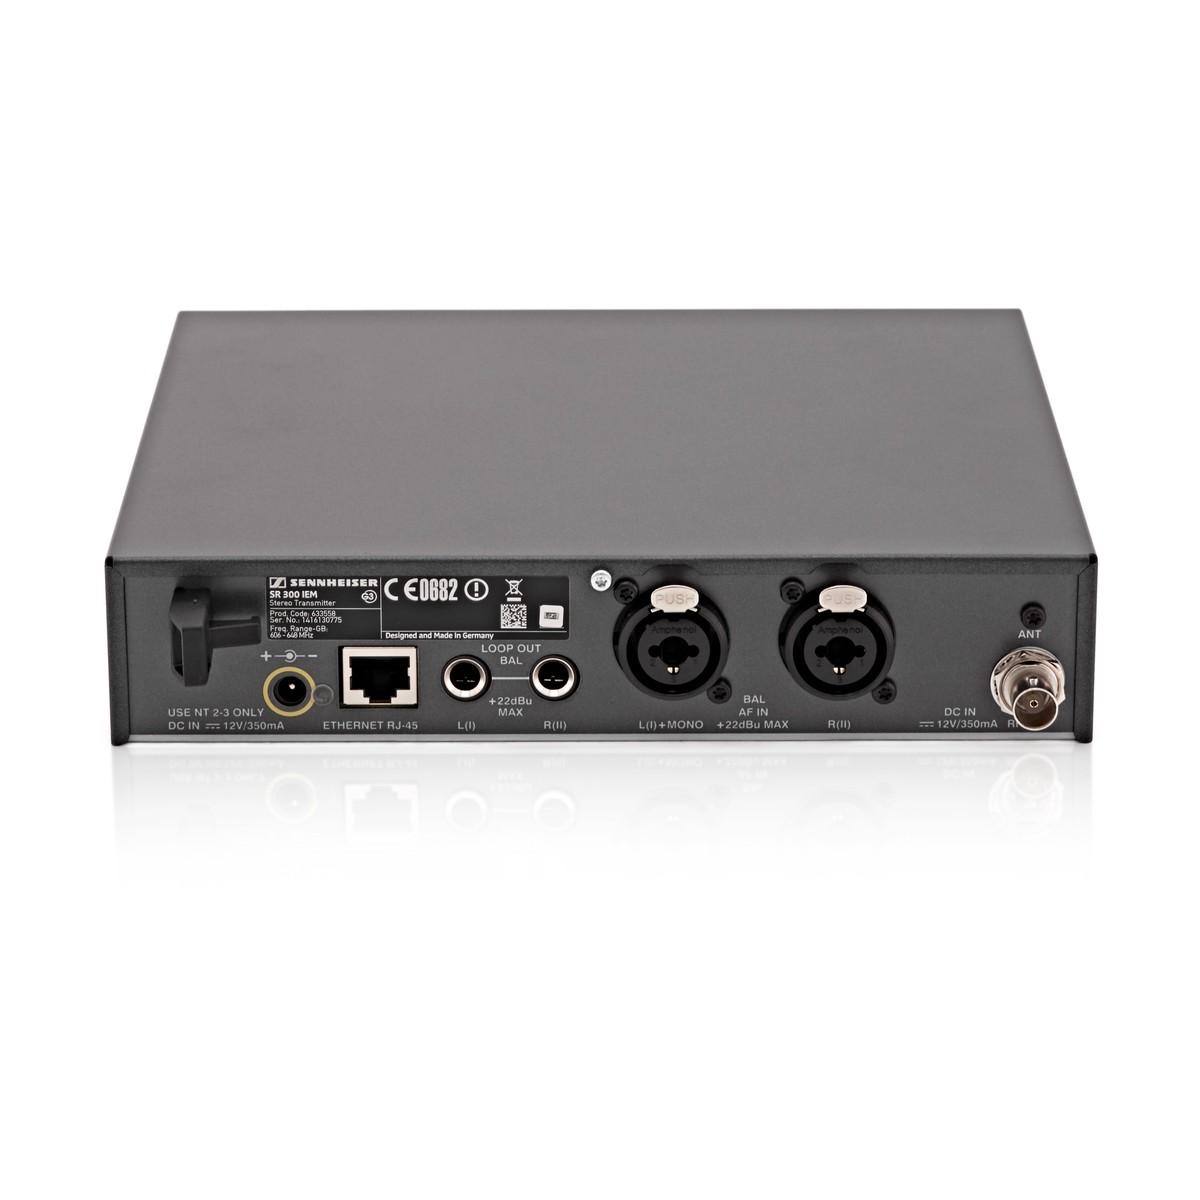 sennheiser ew 300 iem g3 gb wireless in ear monitor system box opened at gear4music. Black Bedroom Furniture Sets. Home Design Ideas